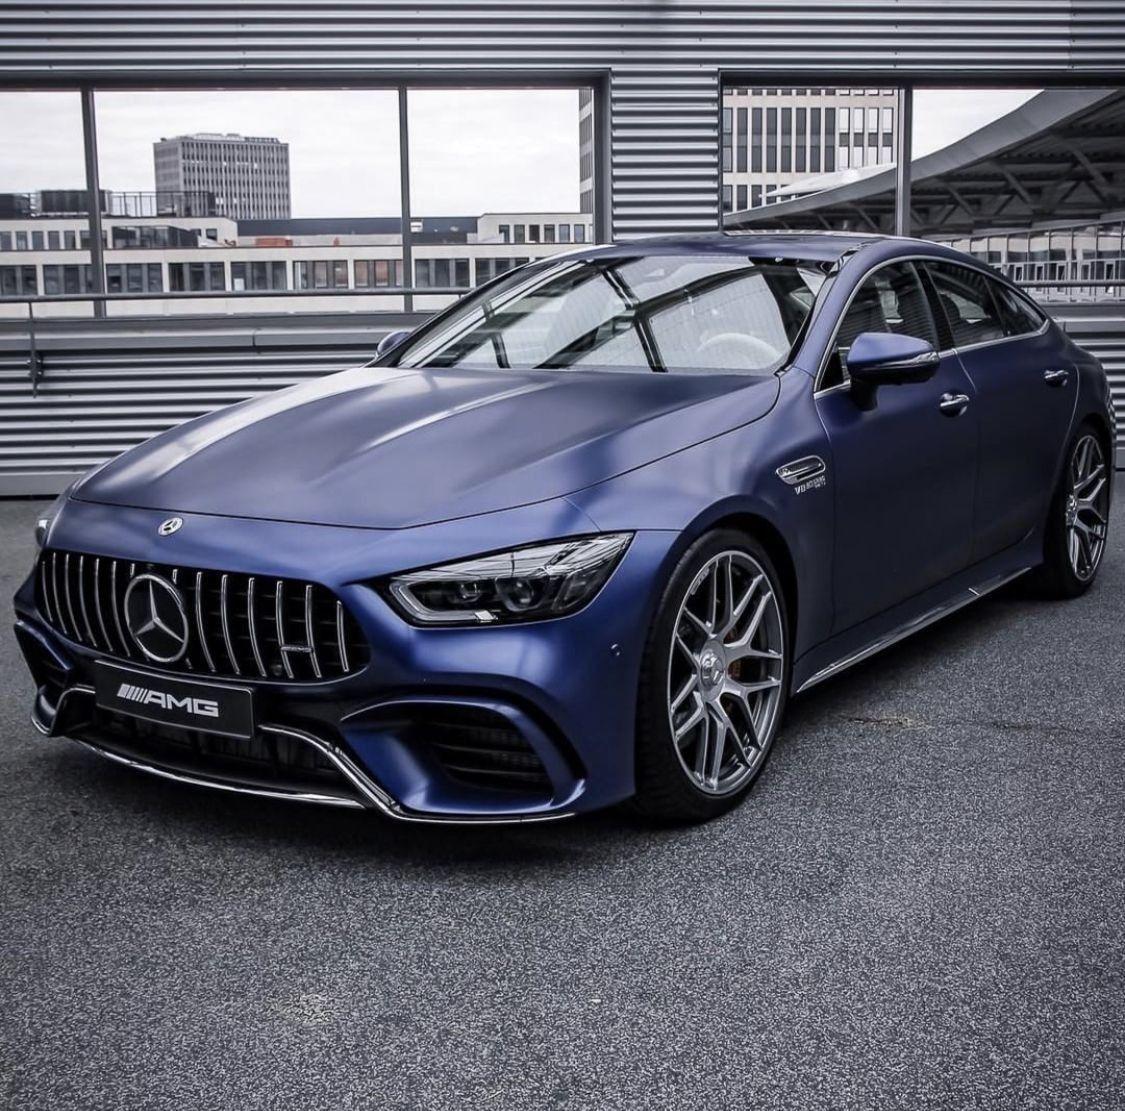 #cars #supercars #blue #mercedes #amg #wallpaper